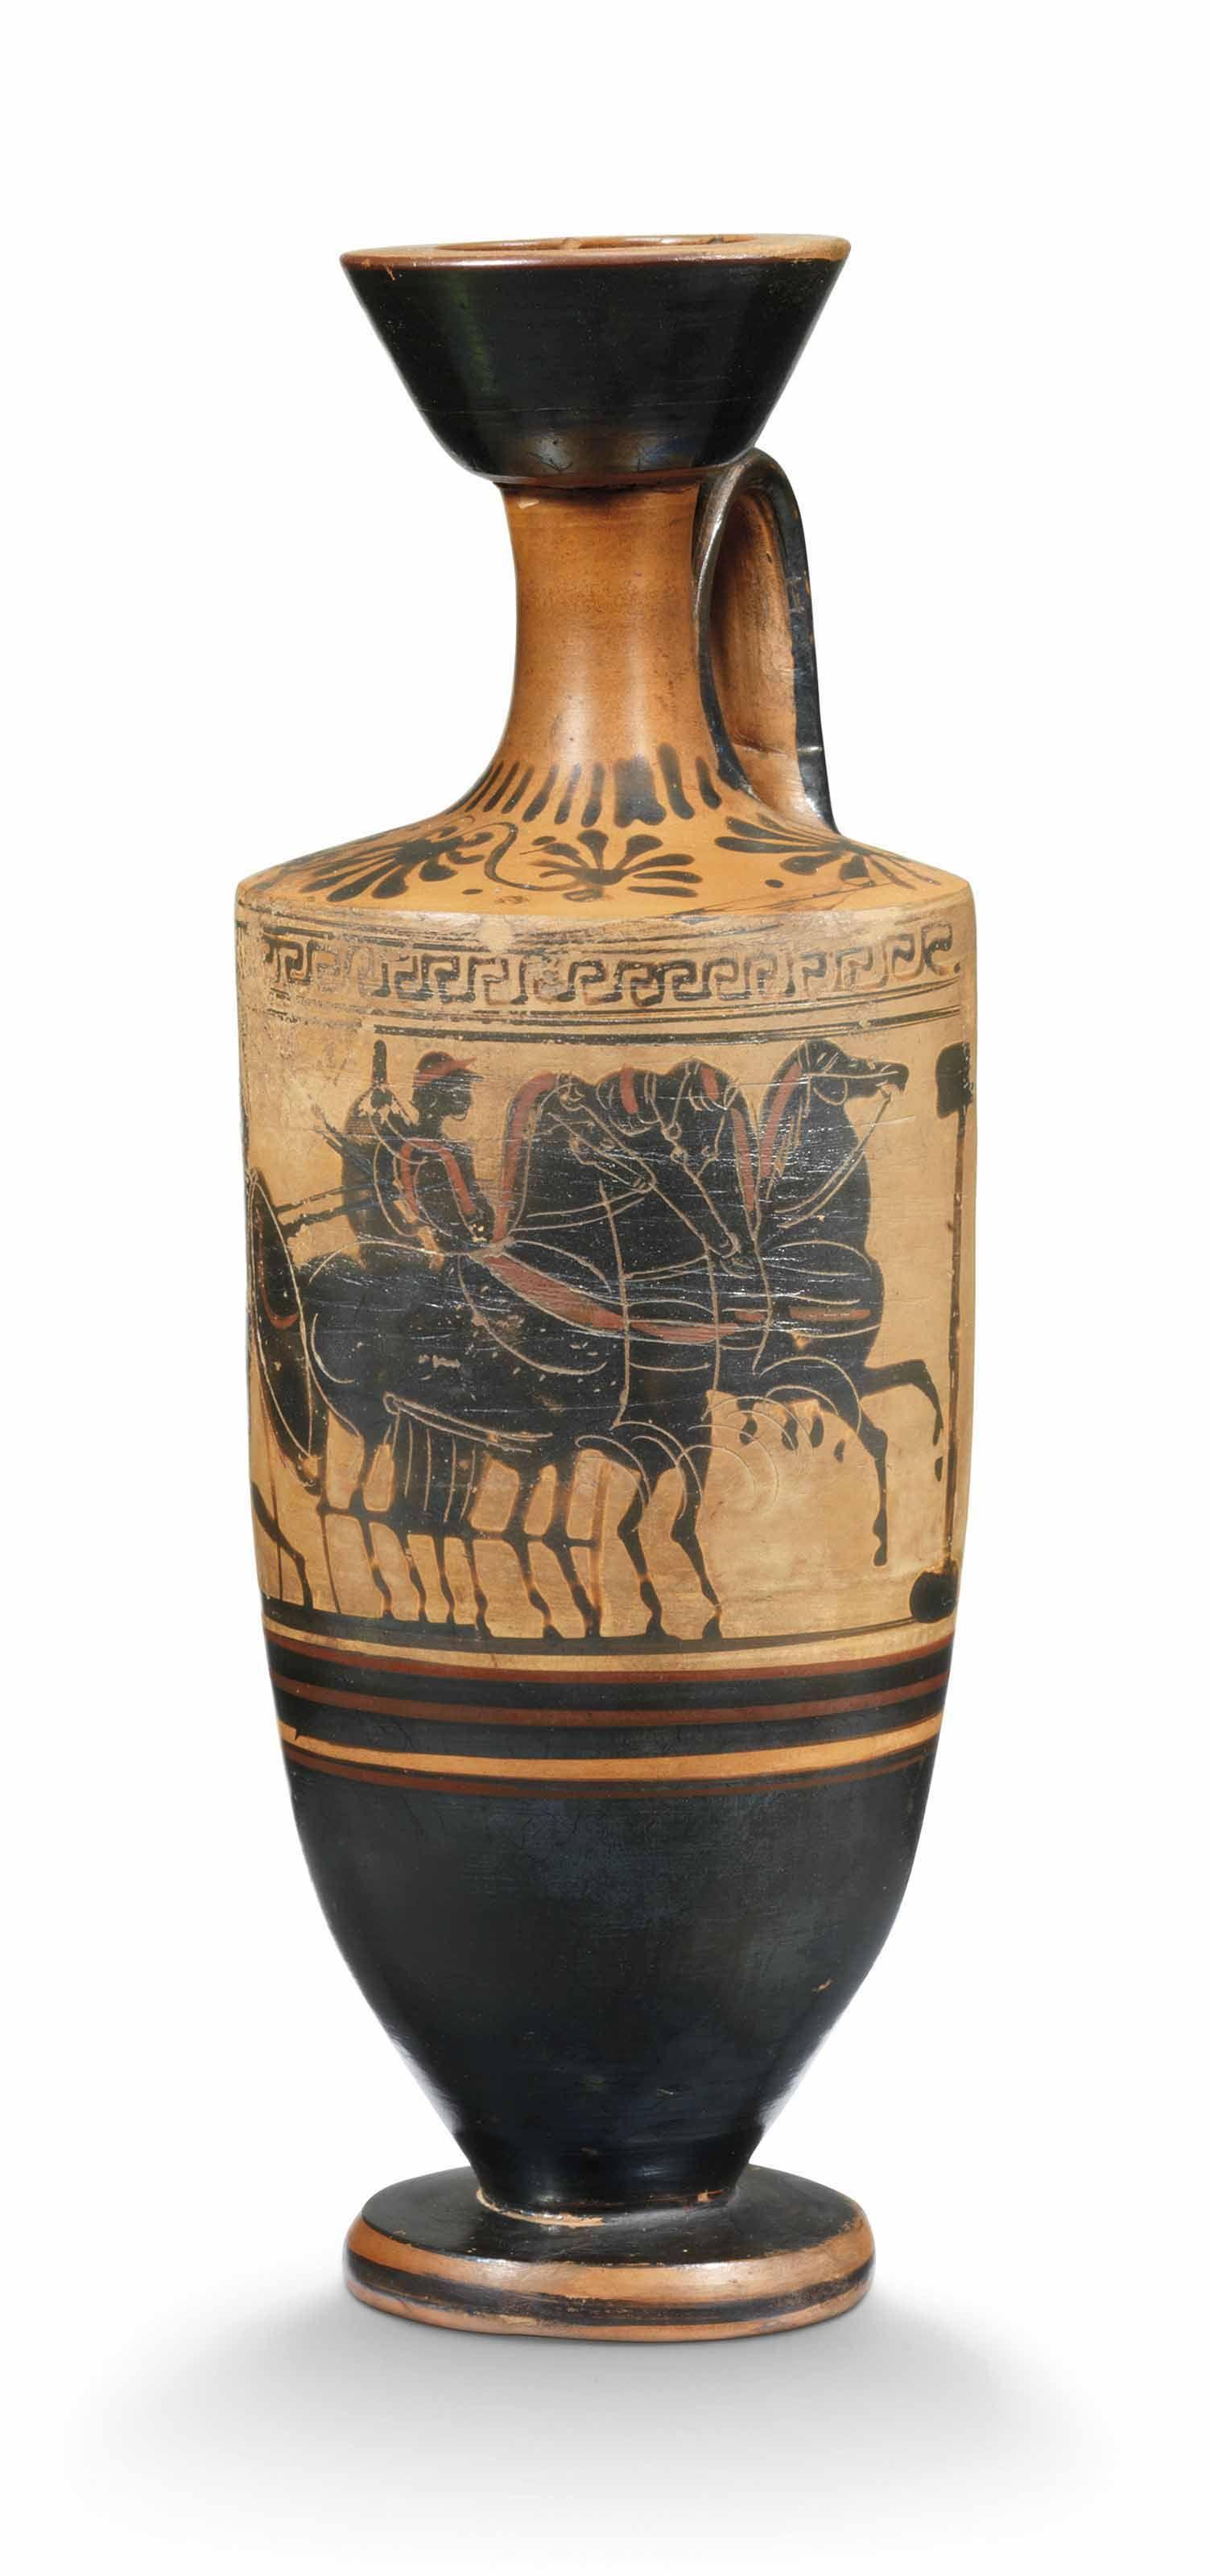 An Attic Black Figured White Ground Lekythos Circa 500 B C Ancient Art Antiquities Vases Christie S Greek Pottery Greek Vases Ancient Pottery